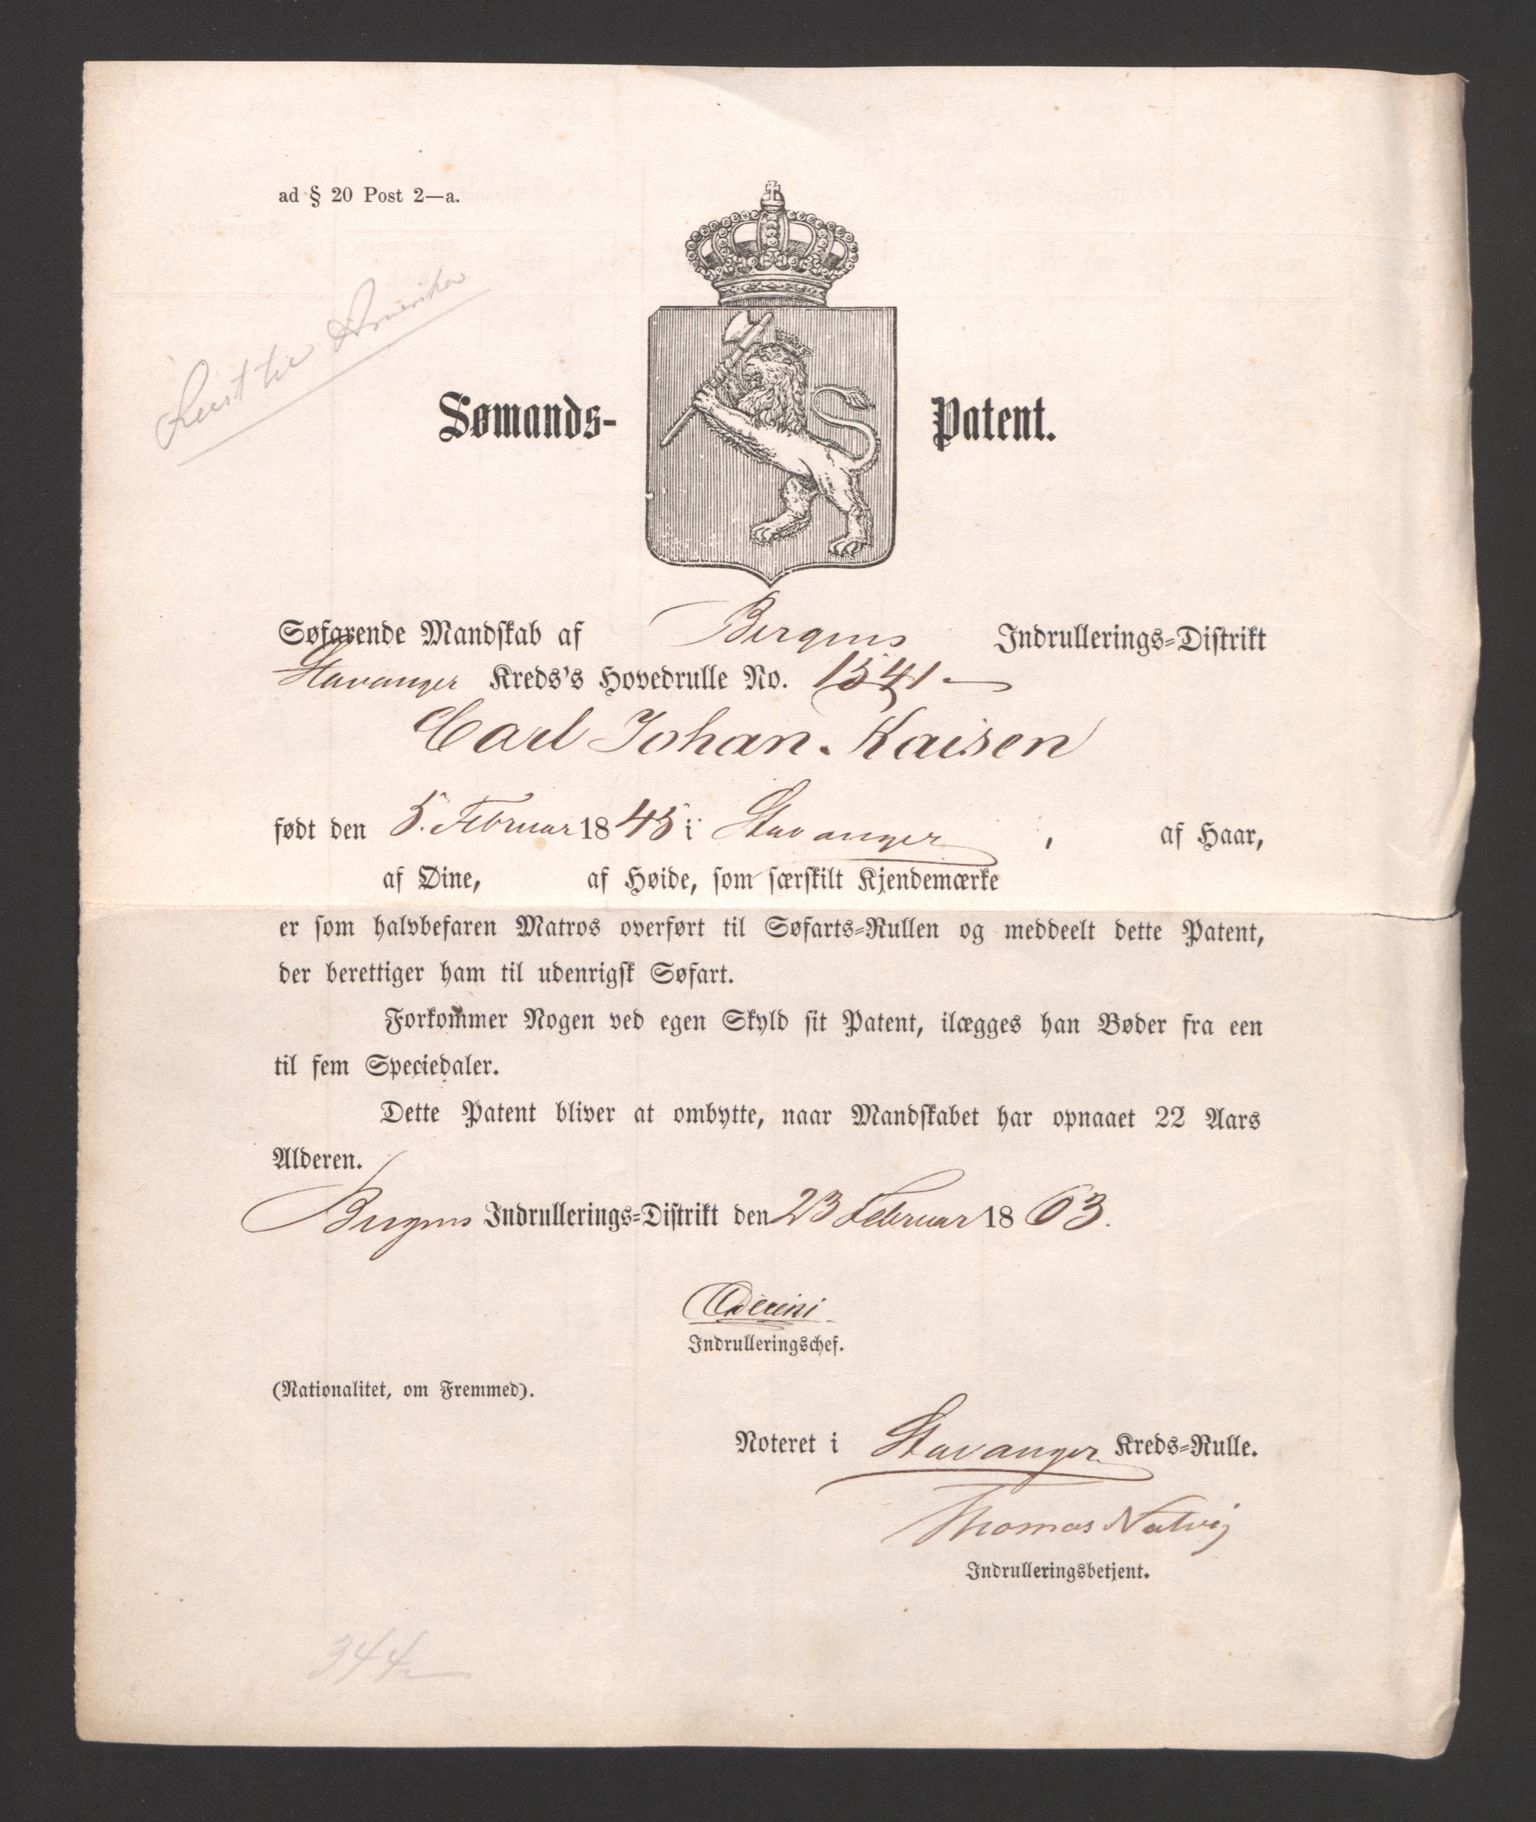 SAST, Stavanger sjømannskontor, F/Fb/Fbb/L0003: Sjøfartshovedrulle, patentnr. 1451-2270, 1863, s. 432